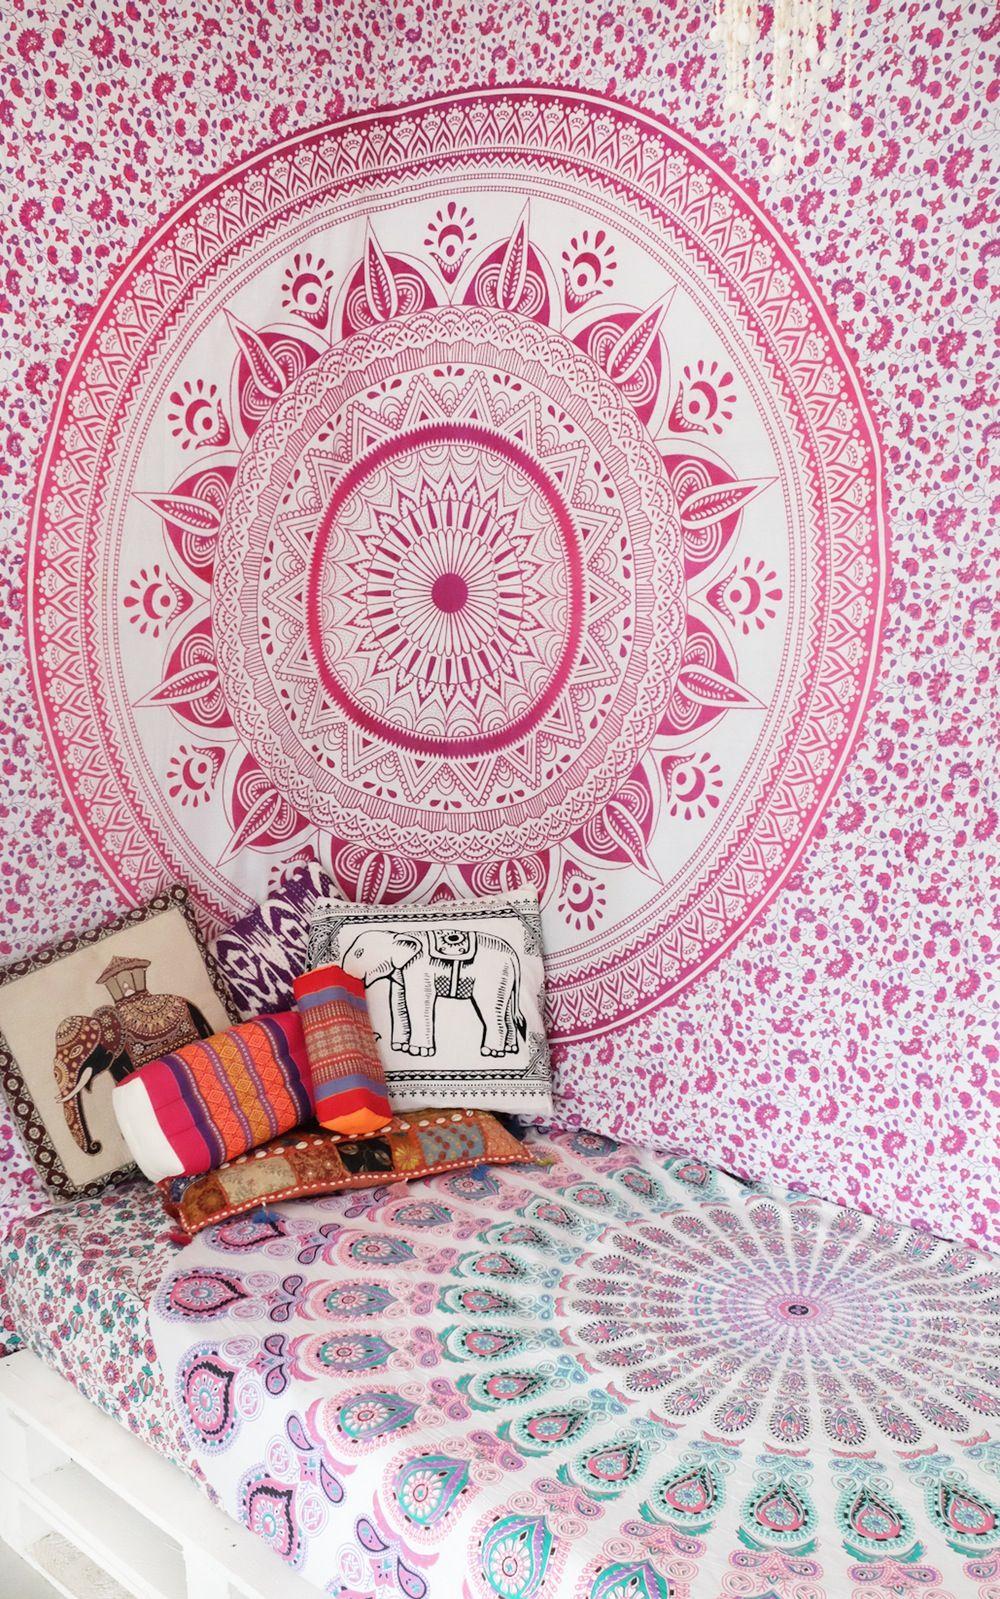 Blue multi elephants sun ombre mandala wall tapestry royalfurnish - Pink Multi Ombre Tapestry Hippie Mandala Bedding Throw On Royalfurnish Com 19 24